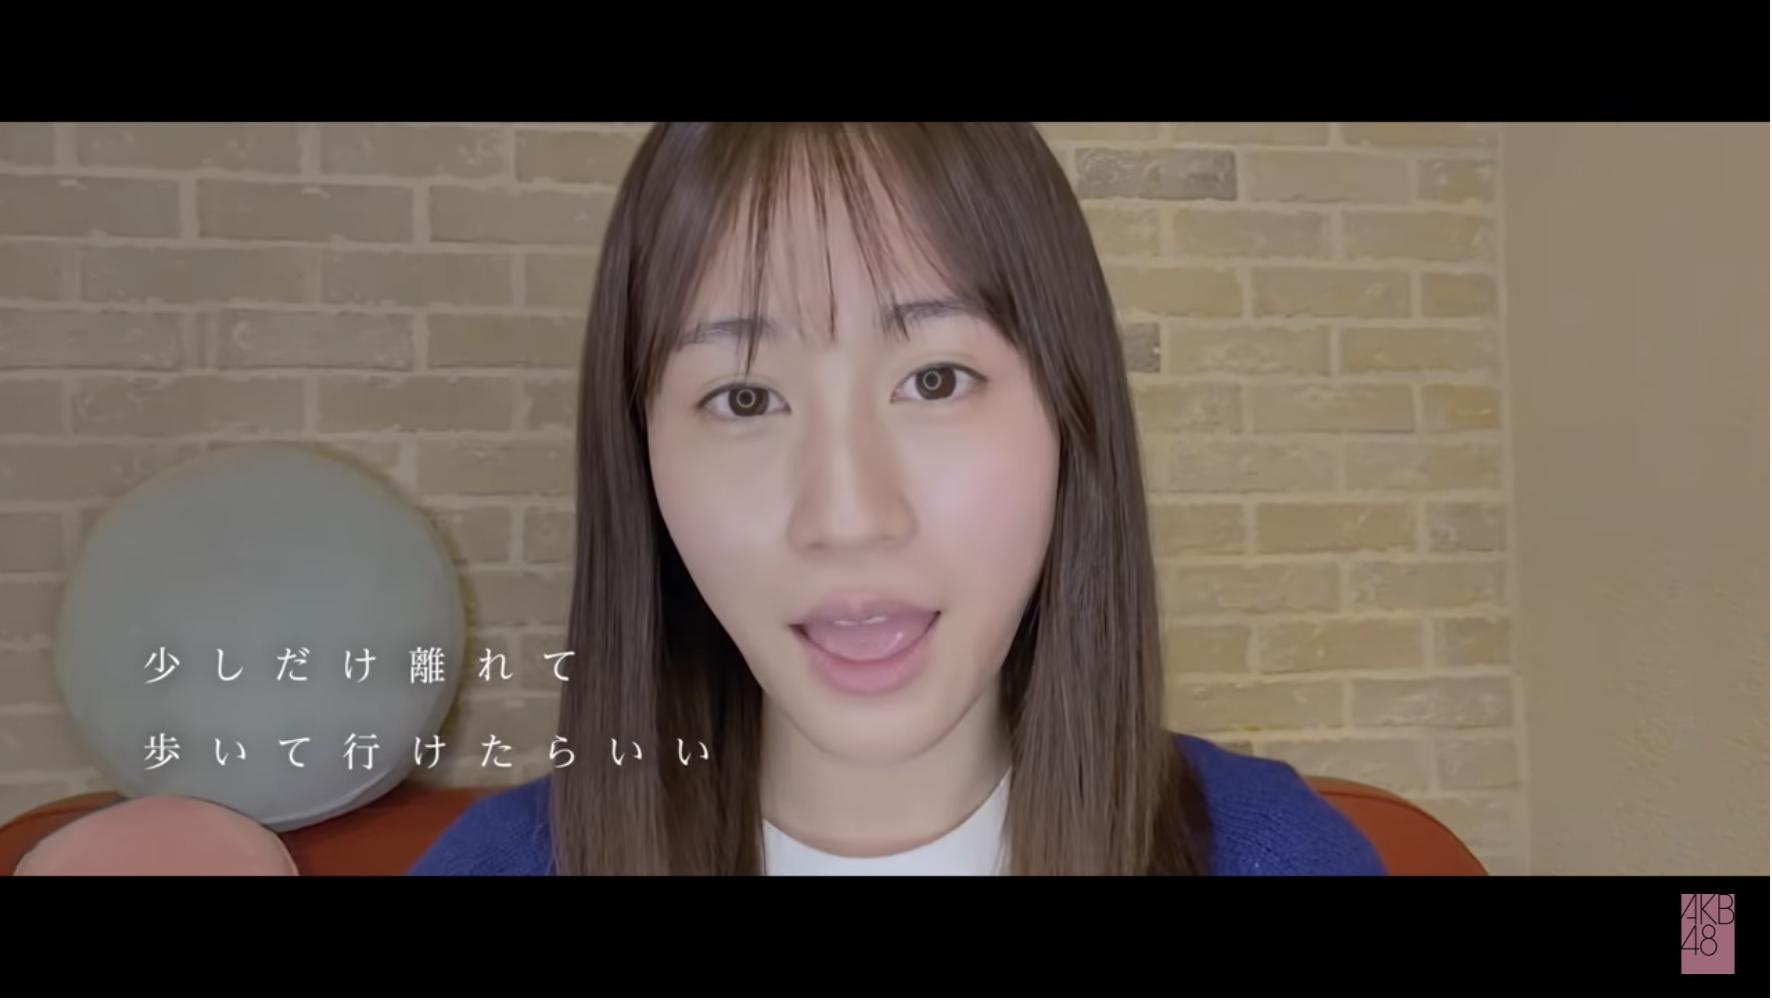 AKB48の新曲「離れていても」に前田敦子らOG出演 乃木坂46の二番煎じか?